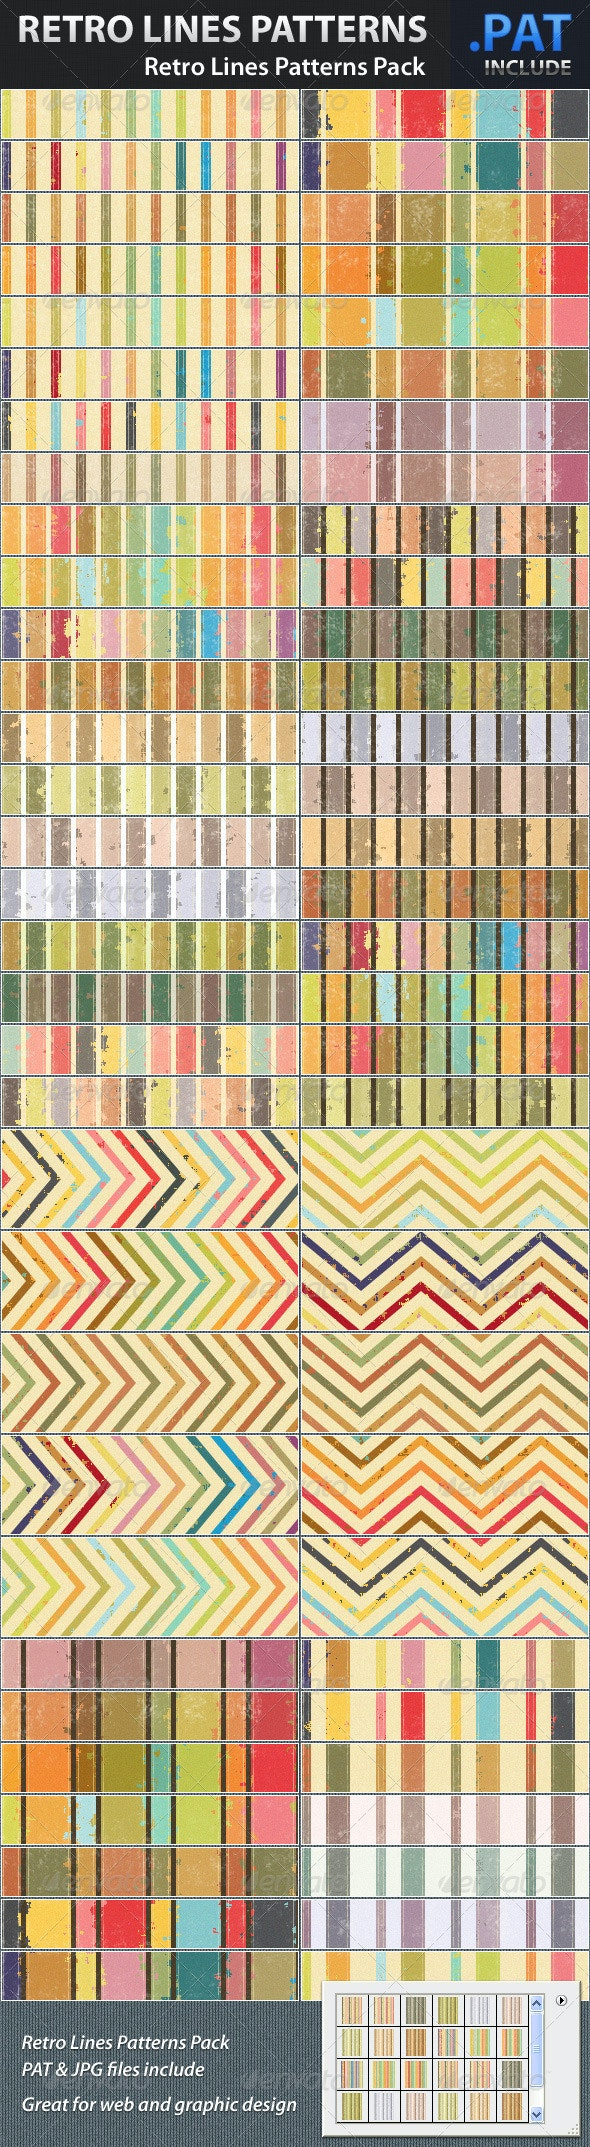 Retro Lines Patterns Pack - Art Textures